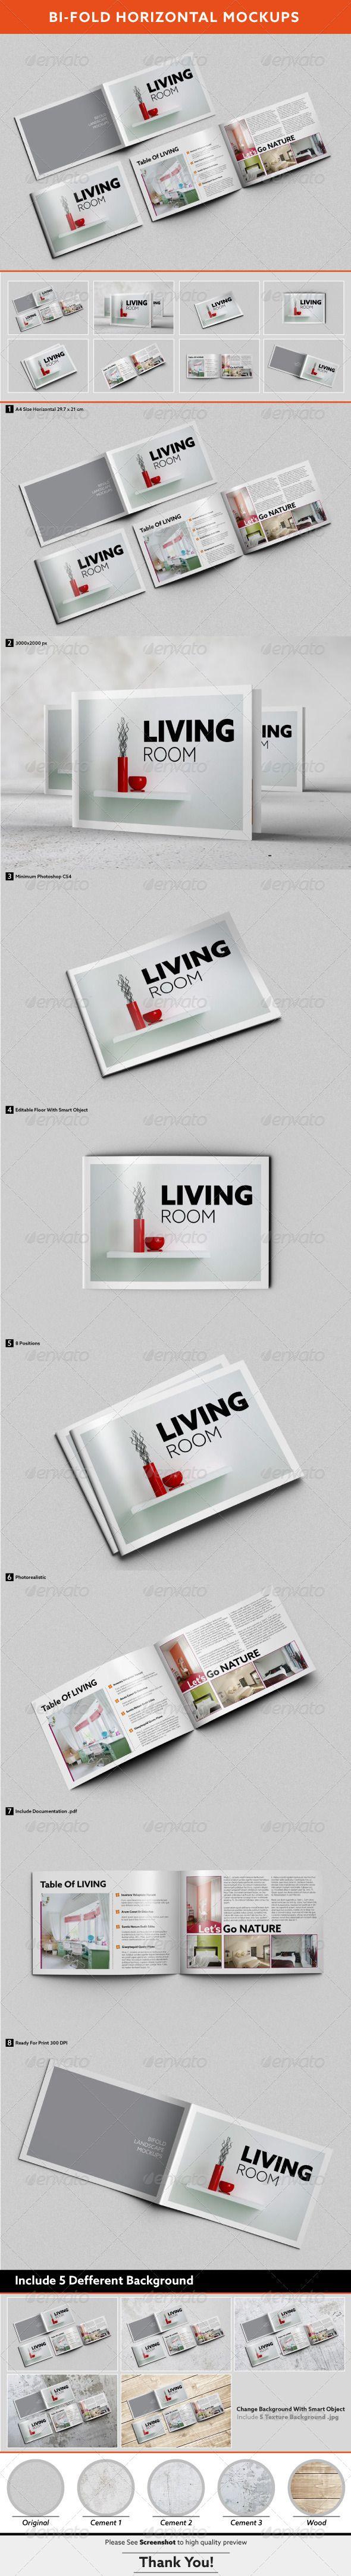 Bi-fold Horizontal Brochure Mockups - Brochures Print